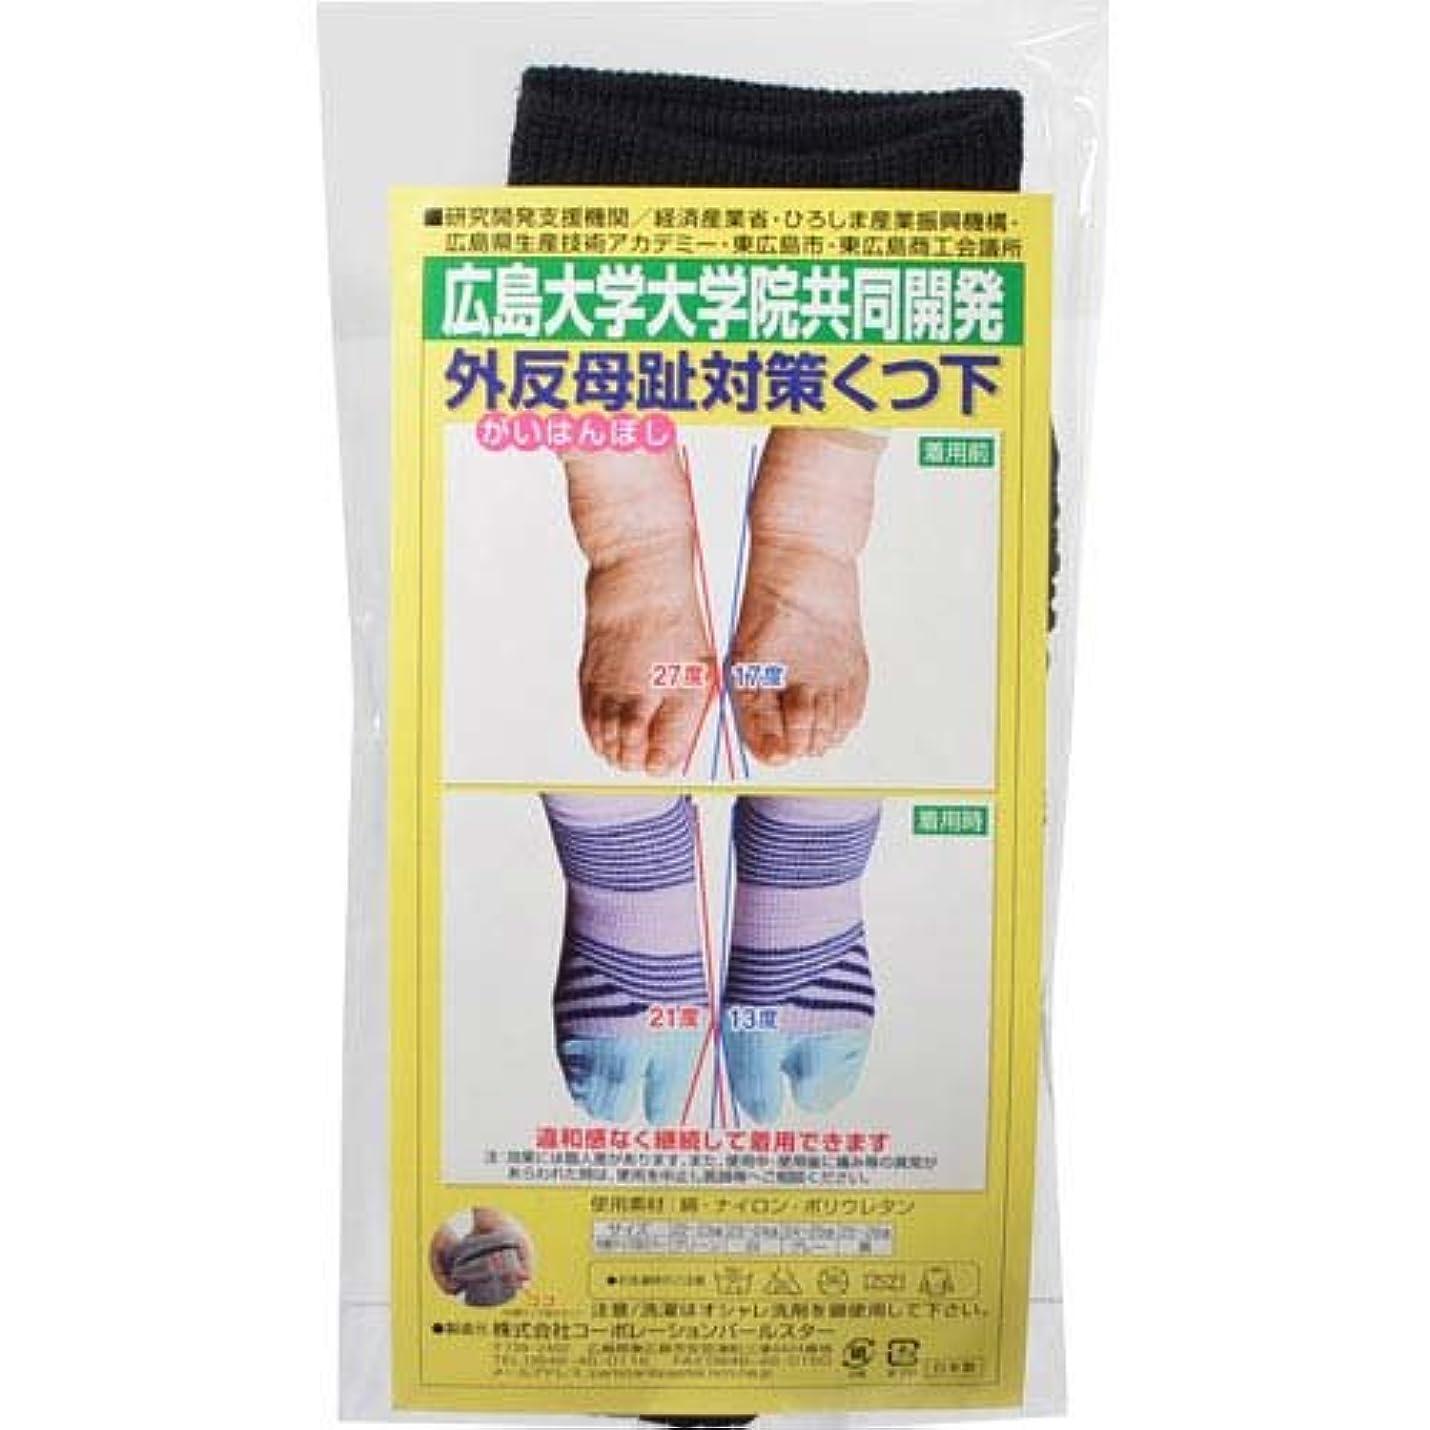 デンプシー遅滞肺炎蘭華 外反母趾対策靴下 黒 22-23cm